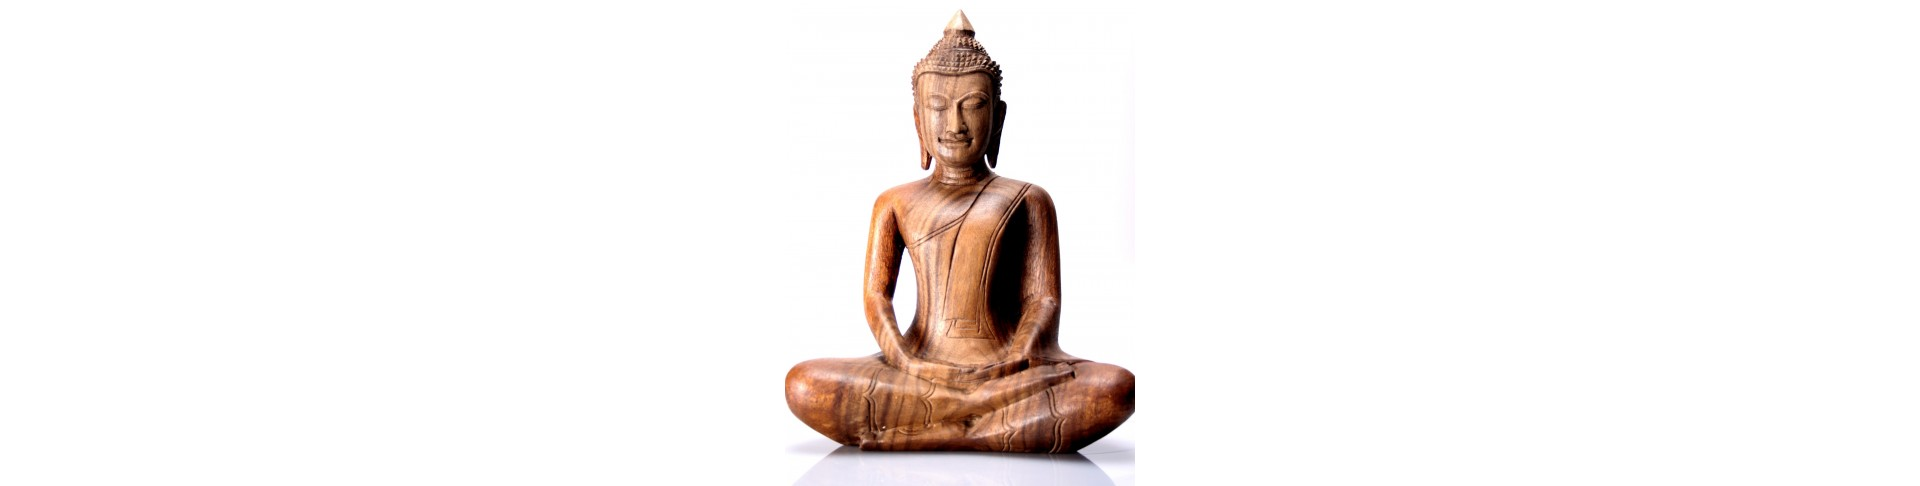 Bouddha Khmer